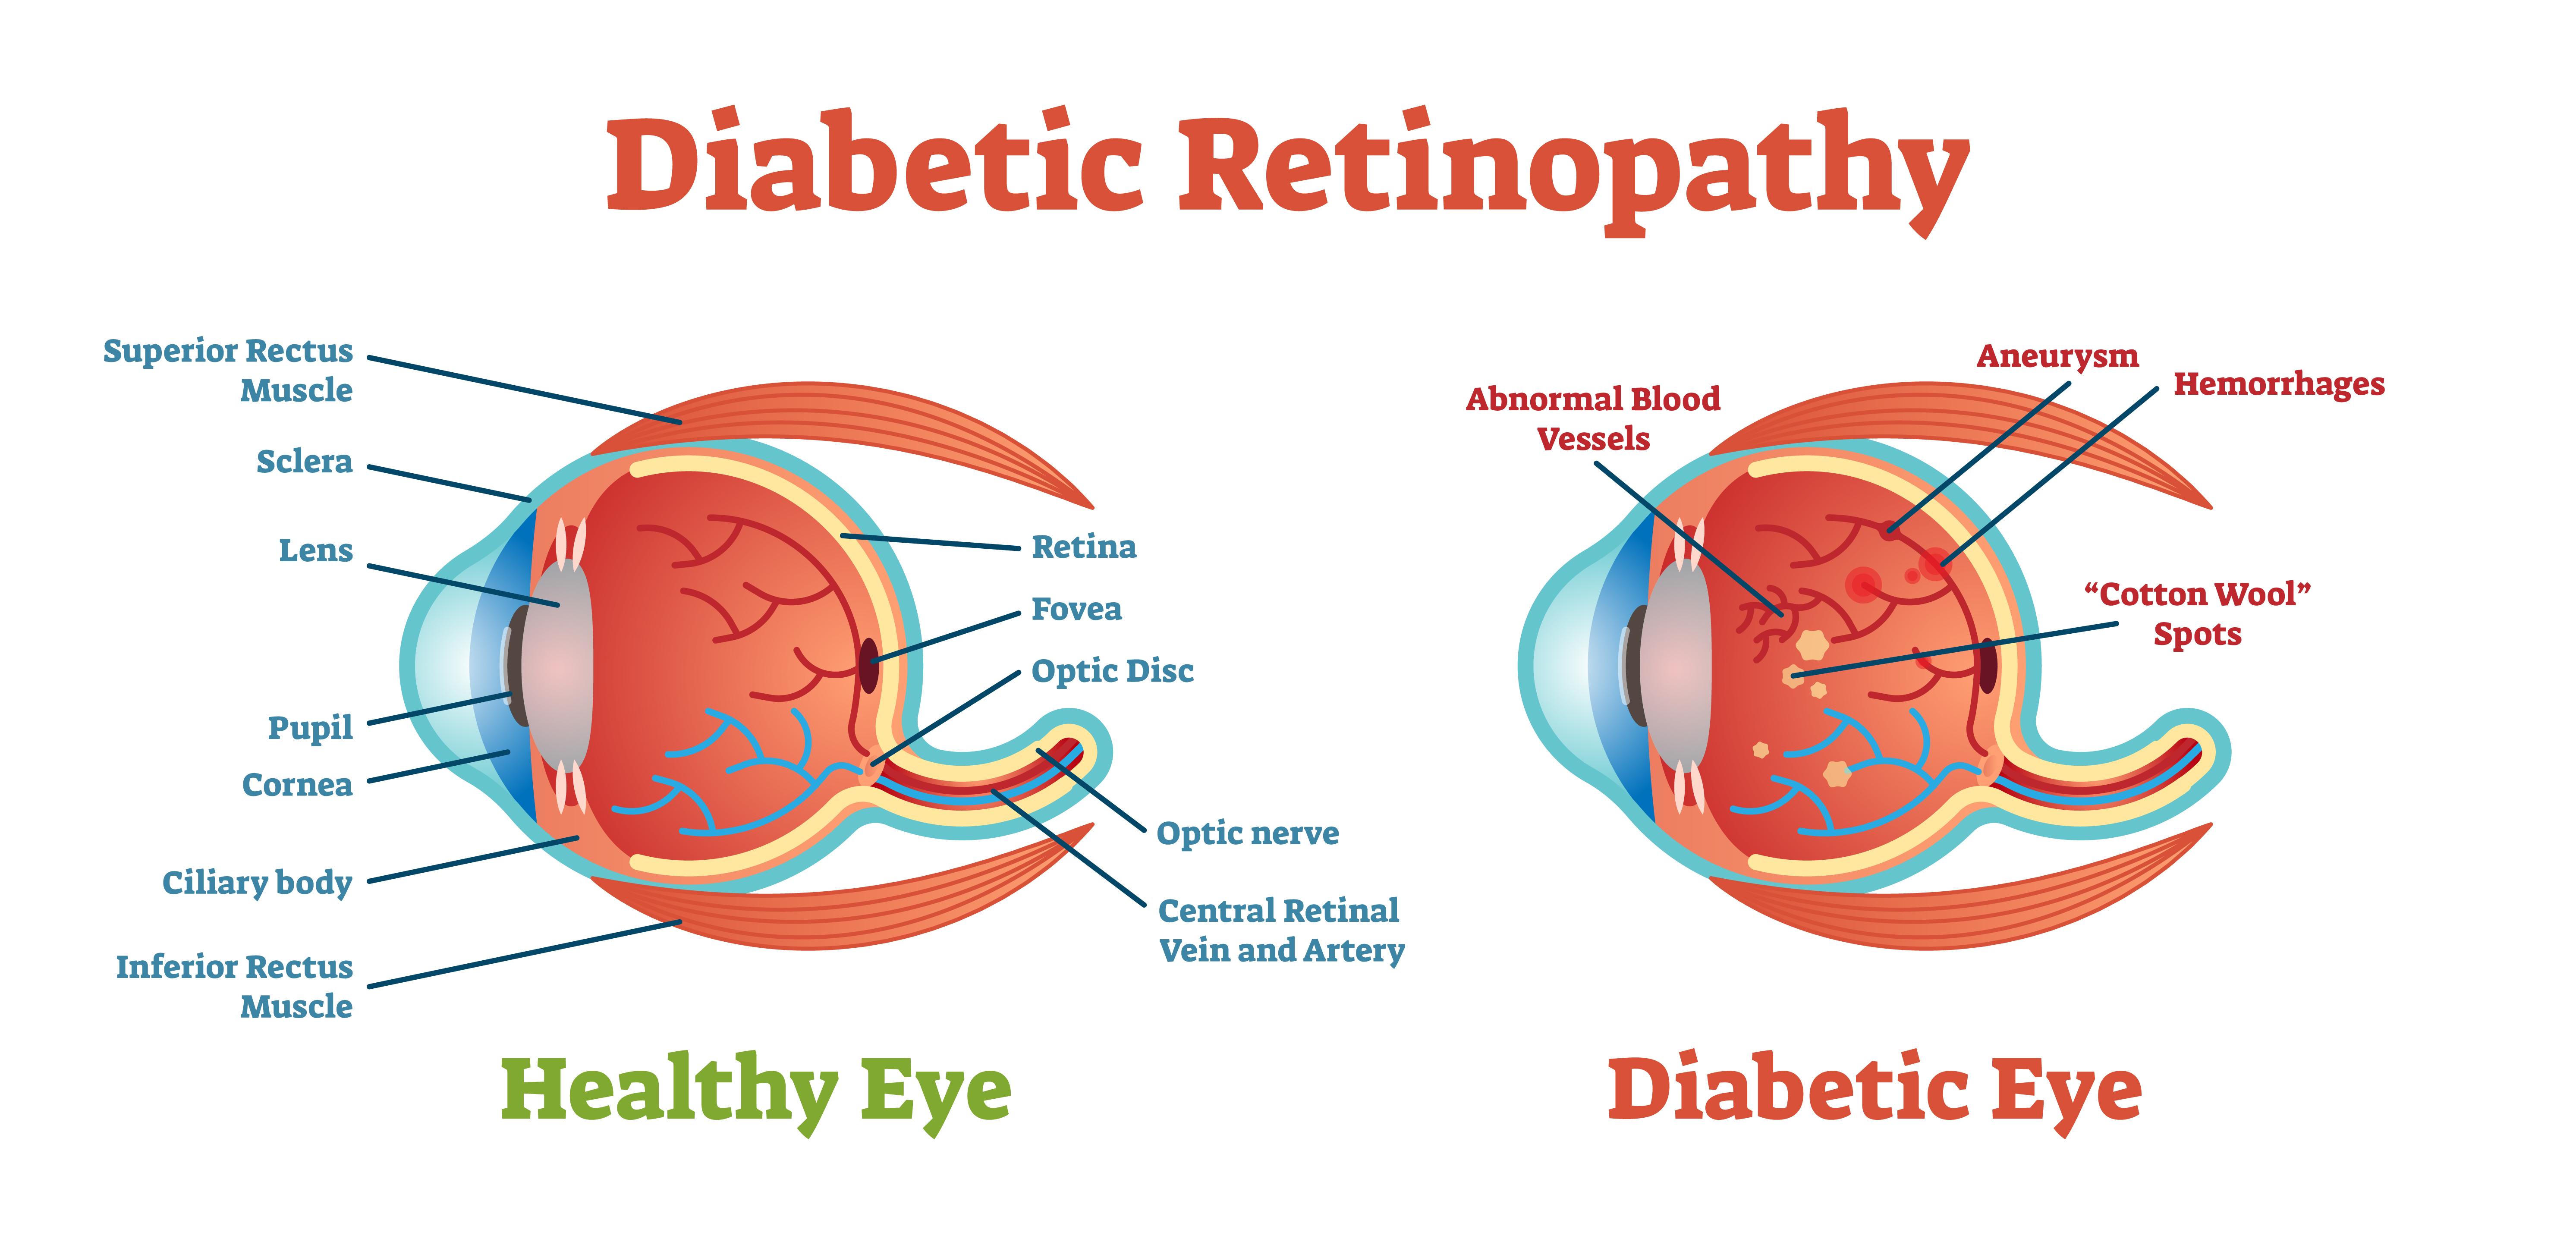 Diabetic Retinopathy vector illustration diagram, anatomical scheme. Medical educational information.